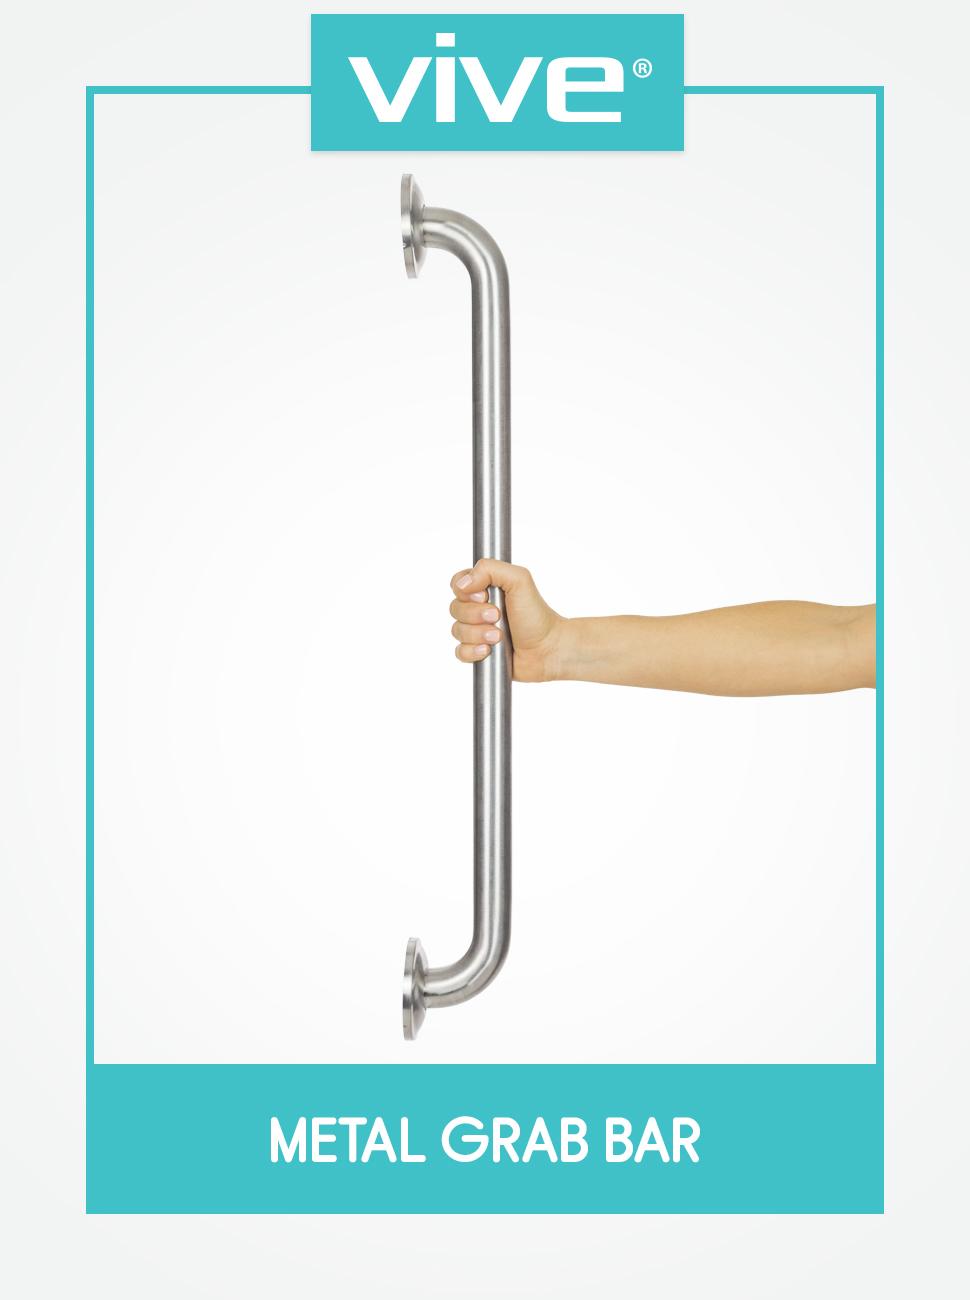 Vive Metal Grab Bar - Balance & Handrail Shower Assist - Bathroom & Bathtub Mounted Safety Hand